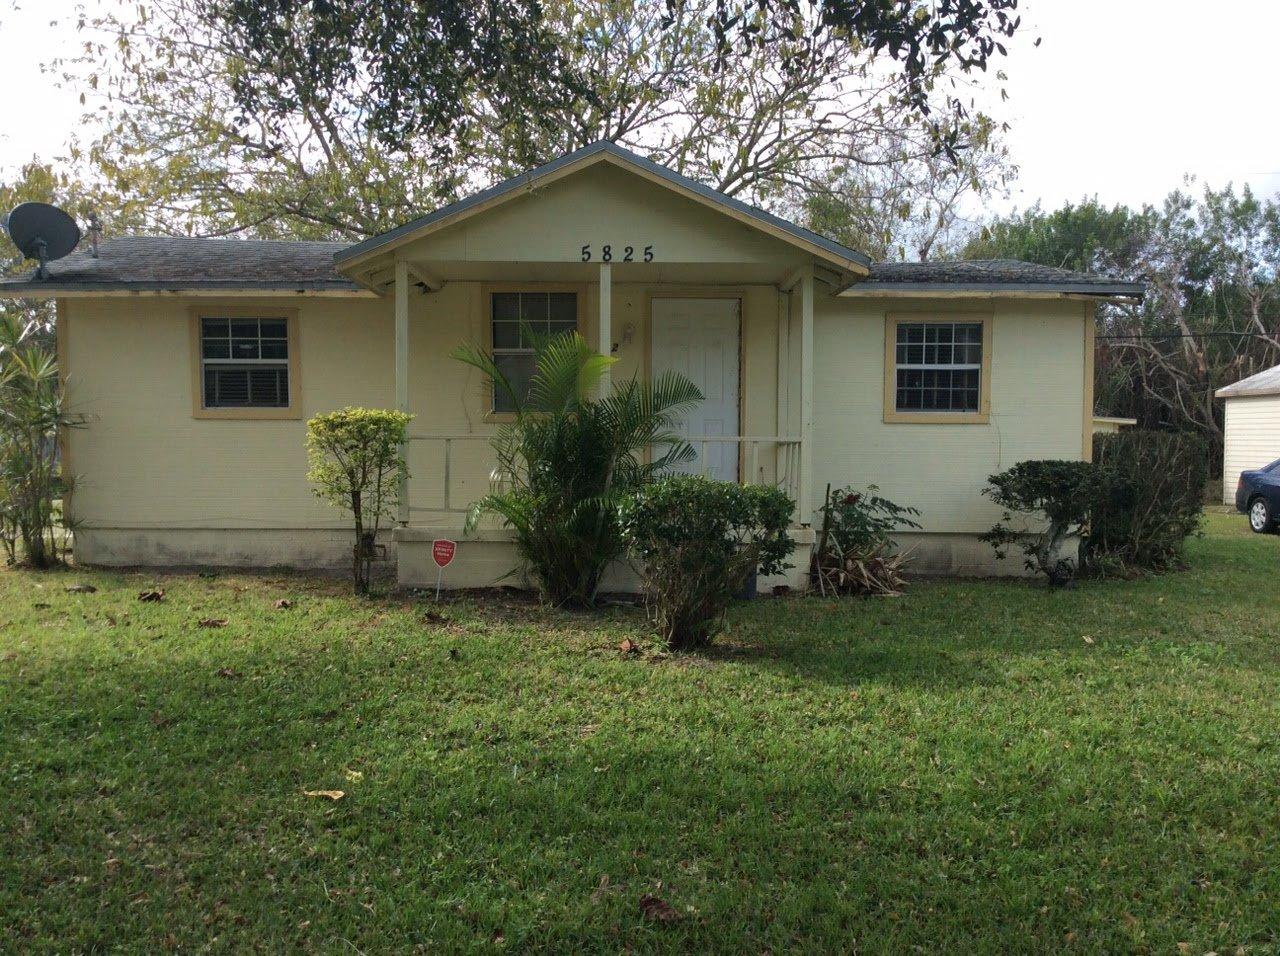 Astounding 5825 59Th Ct Vero Beach Fl 32967 Usa Miami Wholesale Homes Home Interior And Landscaping Palasignezvosmurscom